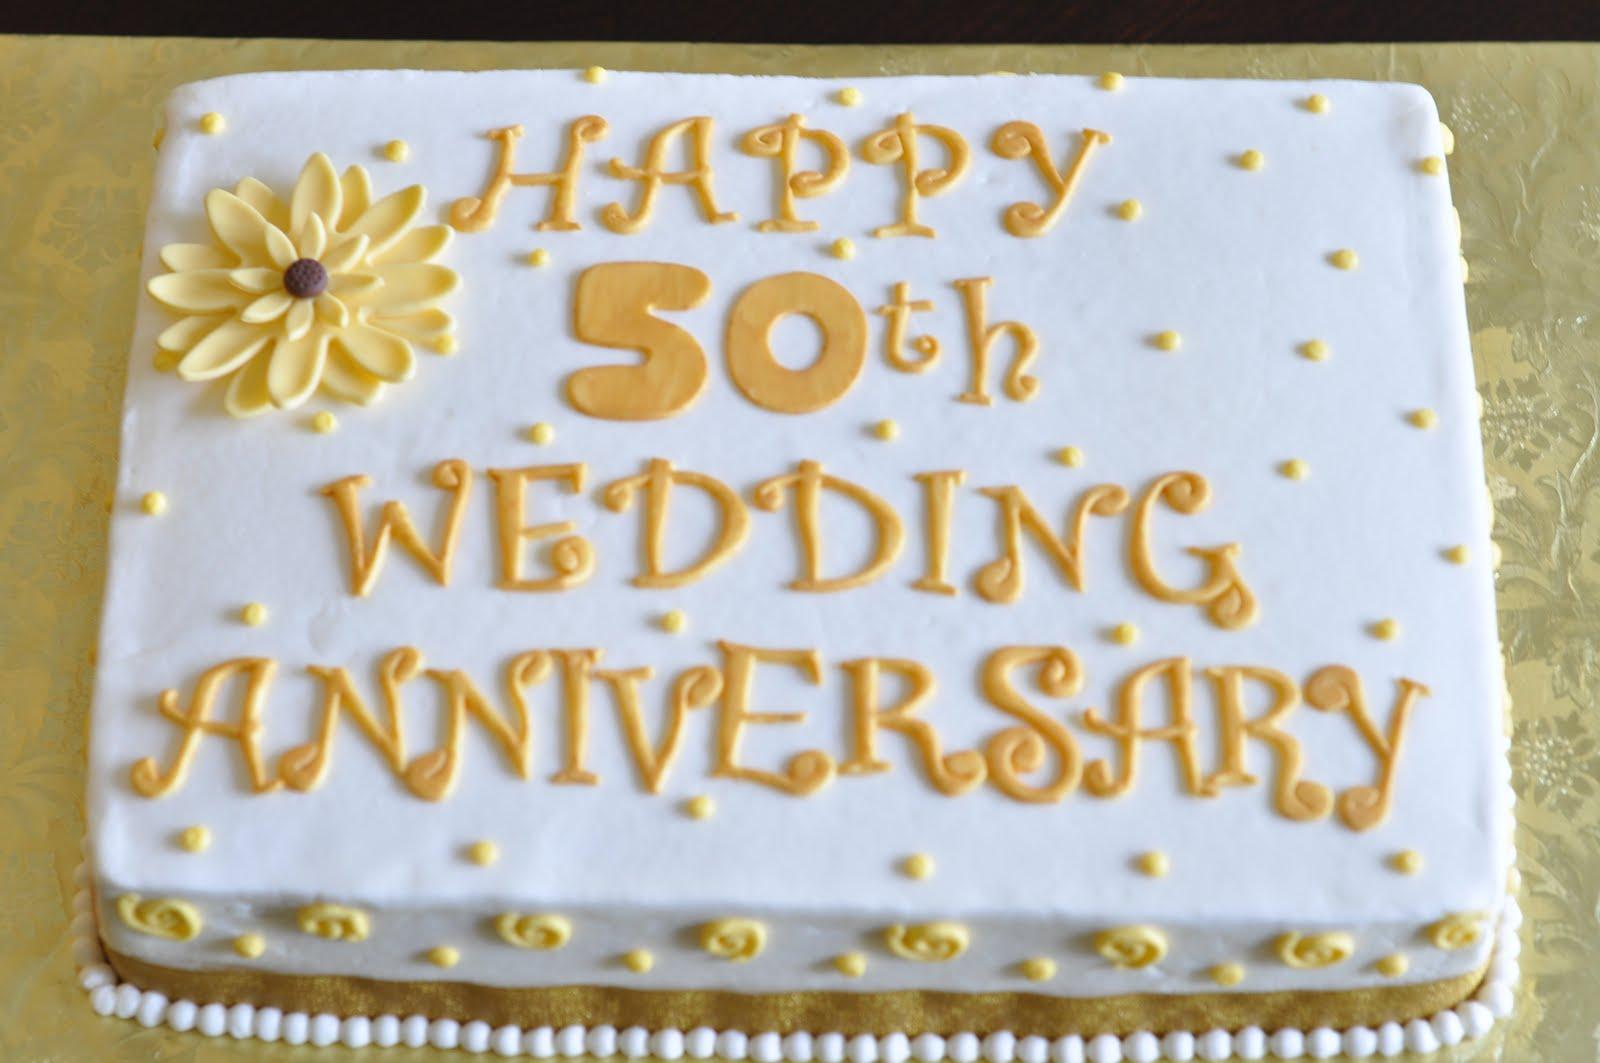 50th wedding anniversary cakes 50th wedding anniversary 50th wedding anniversary fondant cakes